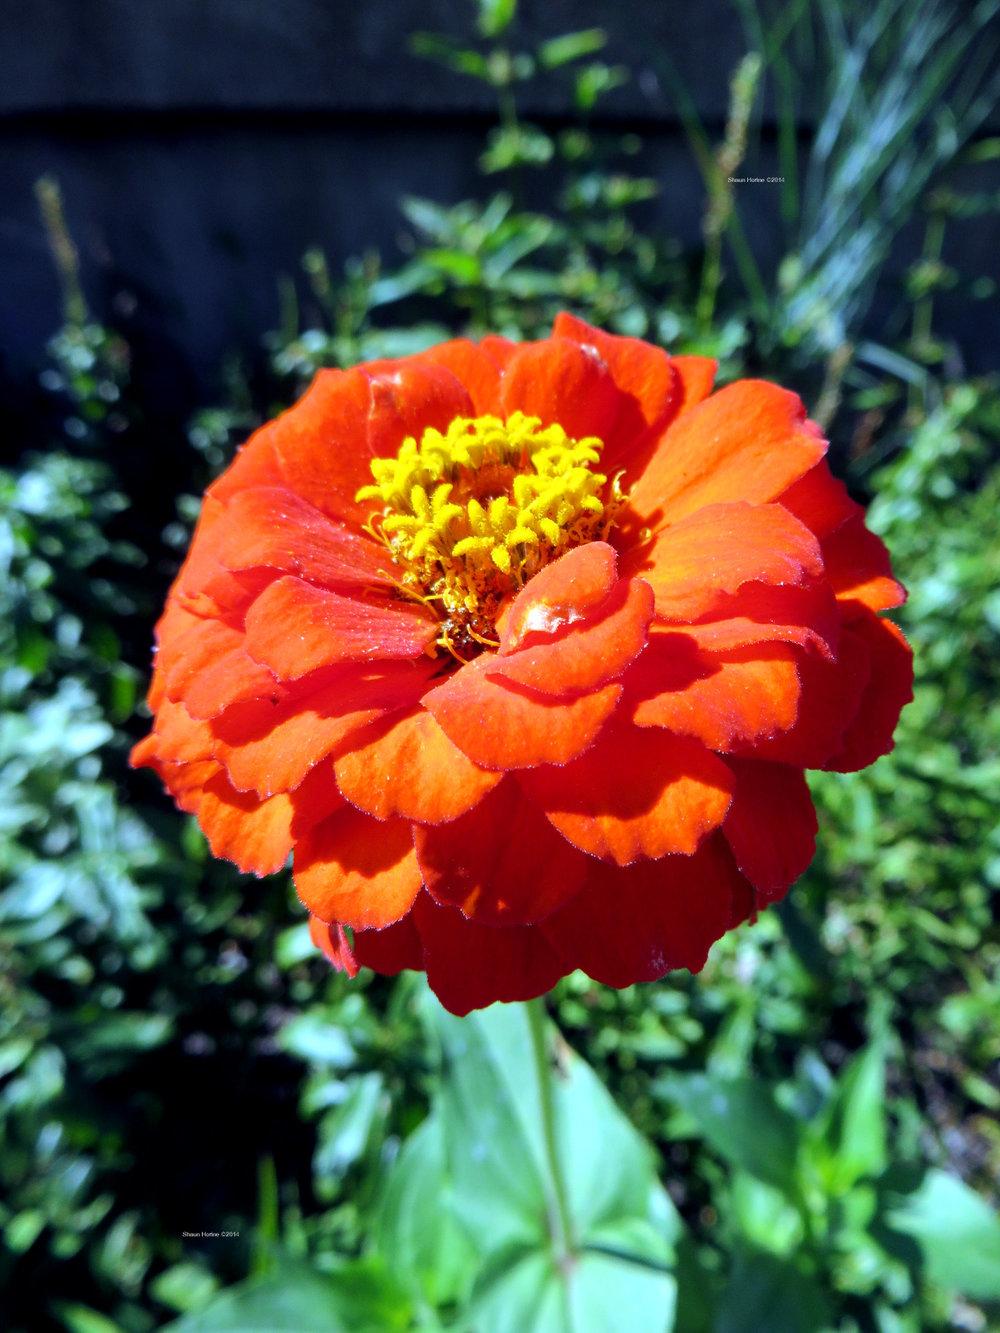 Macro of a bright orange-red flower. Baptist Hospital Lexington, KY. Canon SX280 HS